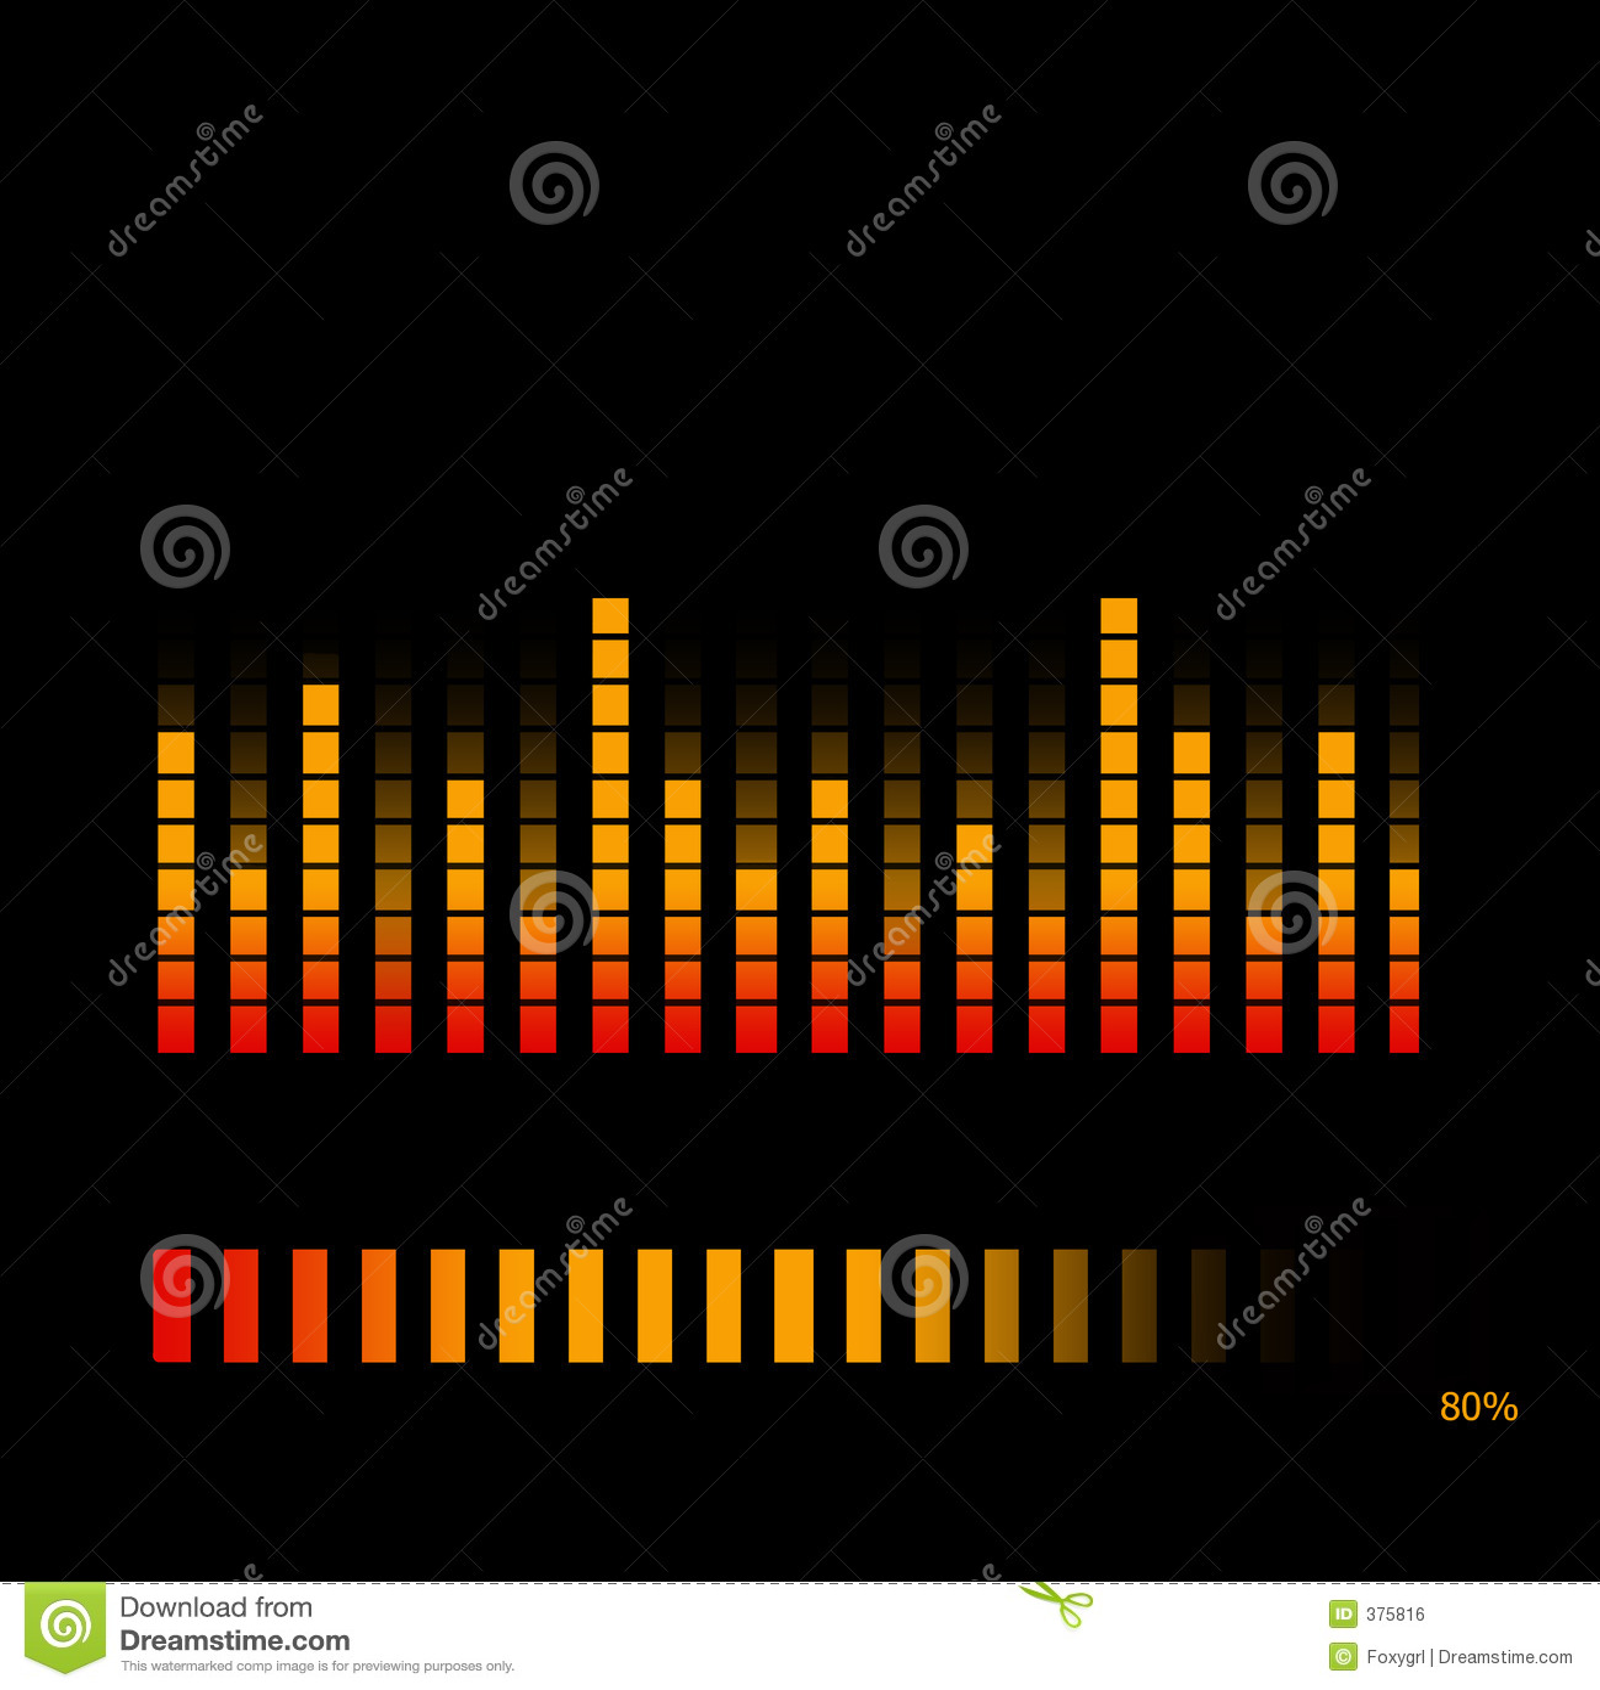 volume equalizer royalty free stock image